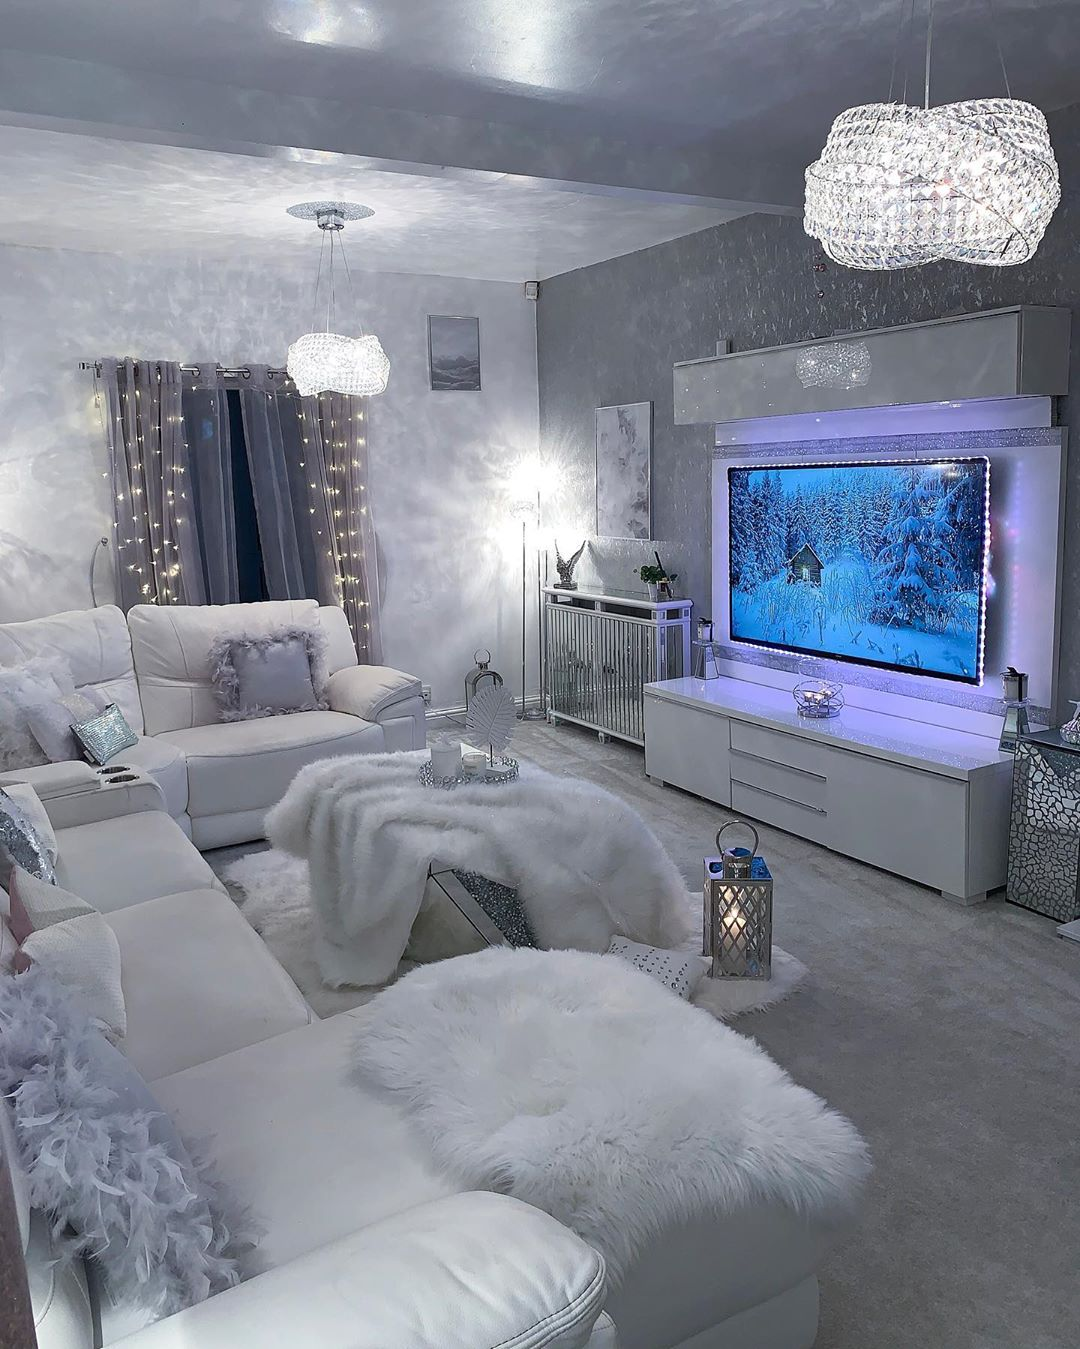 Ideas For Christmas... 🤫 —————————————— Cleaninghouse - Decoration Ideas